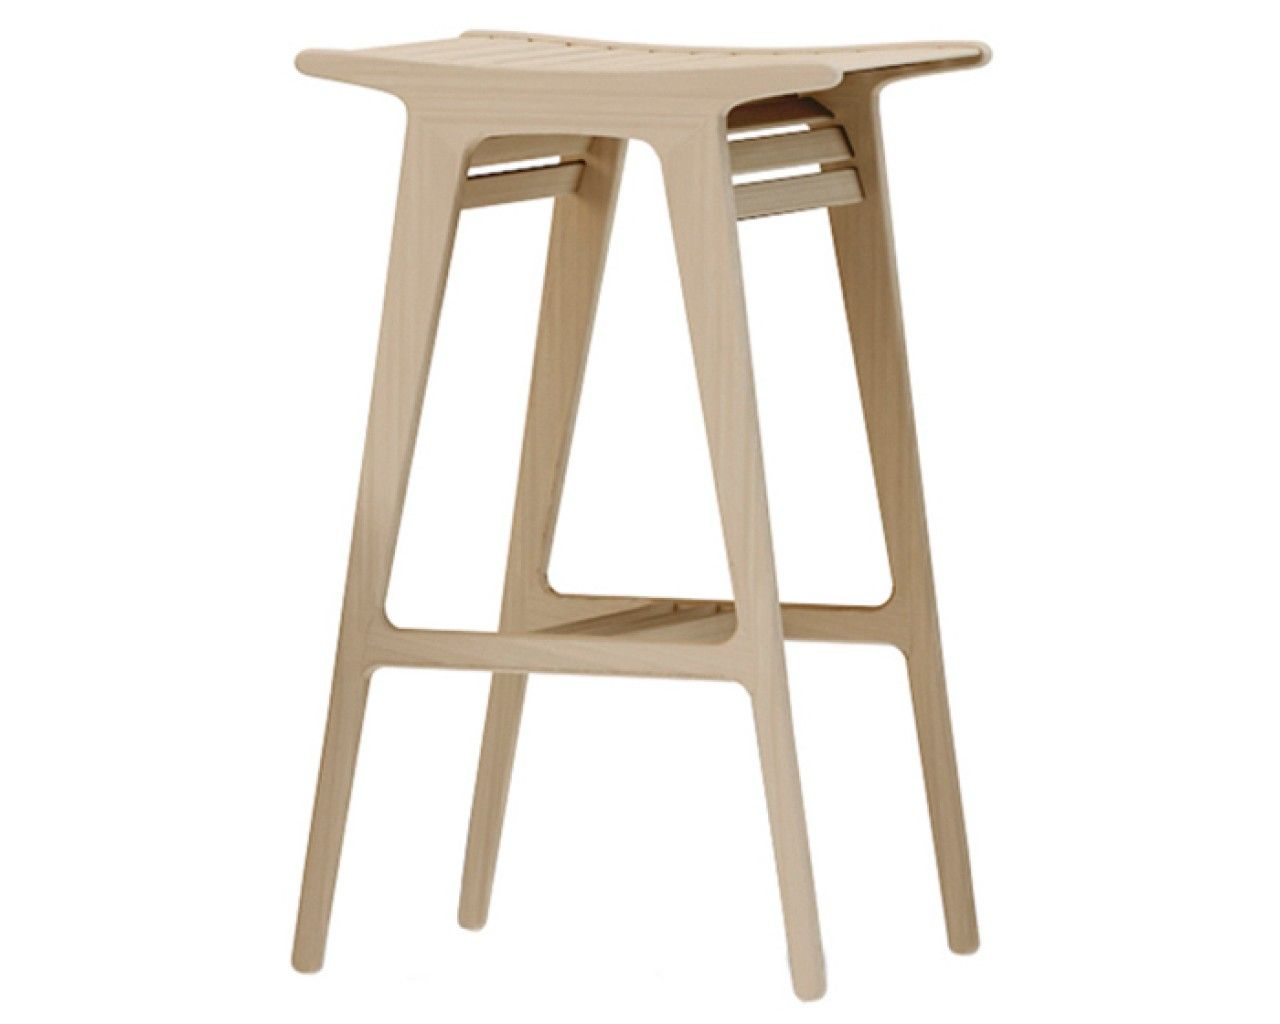 Design Barstuhl Holz Midj Jadé, 75 cm Sitzhöhe